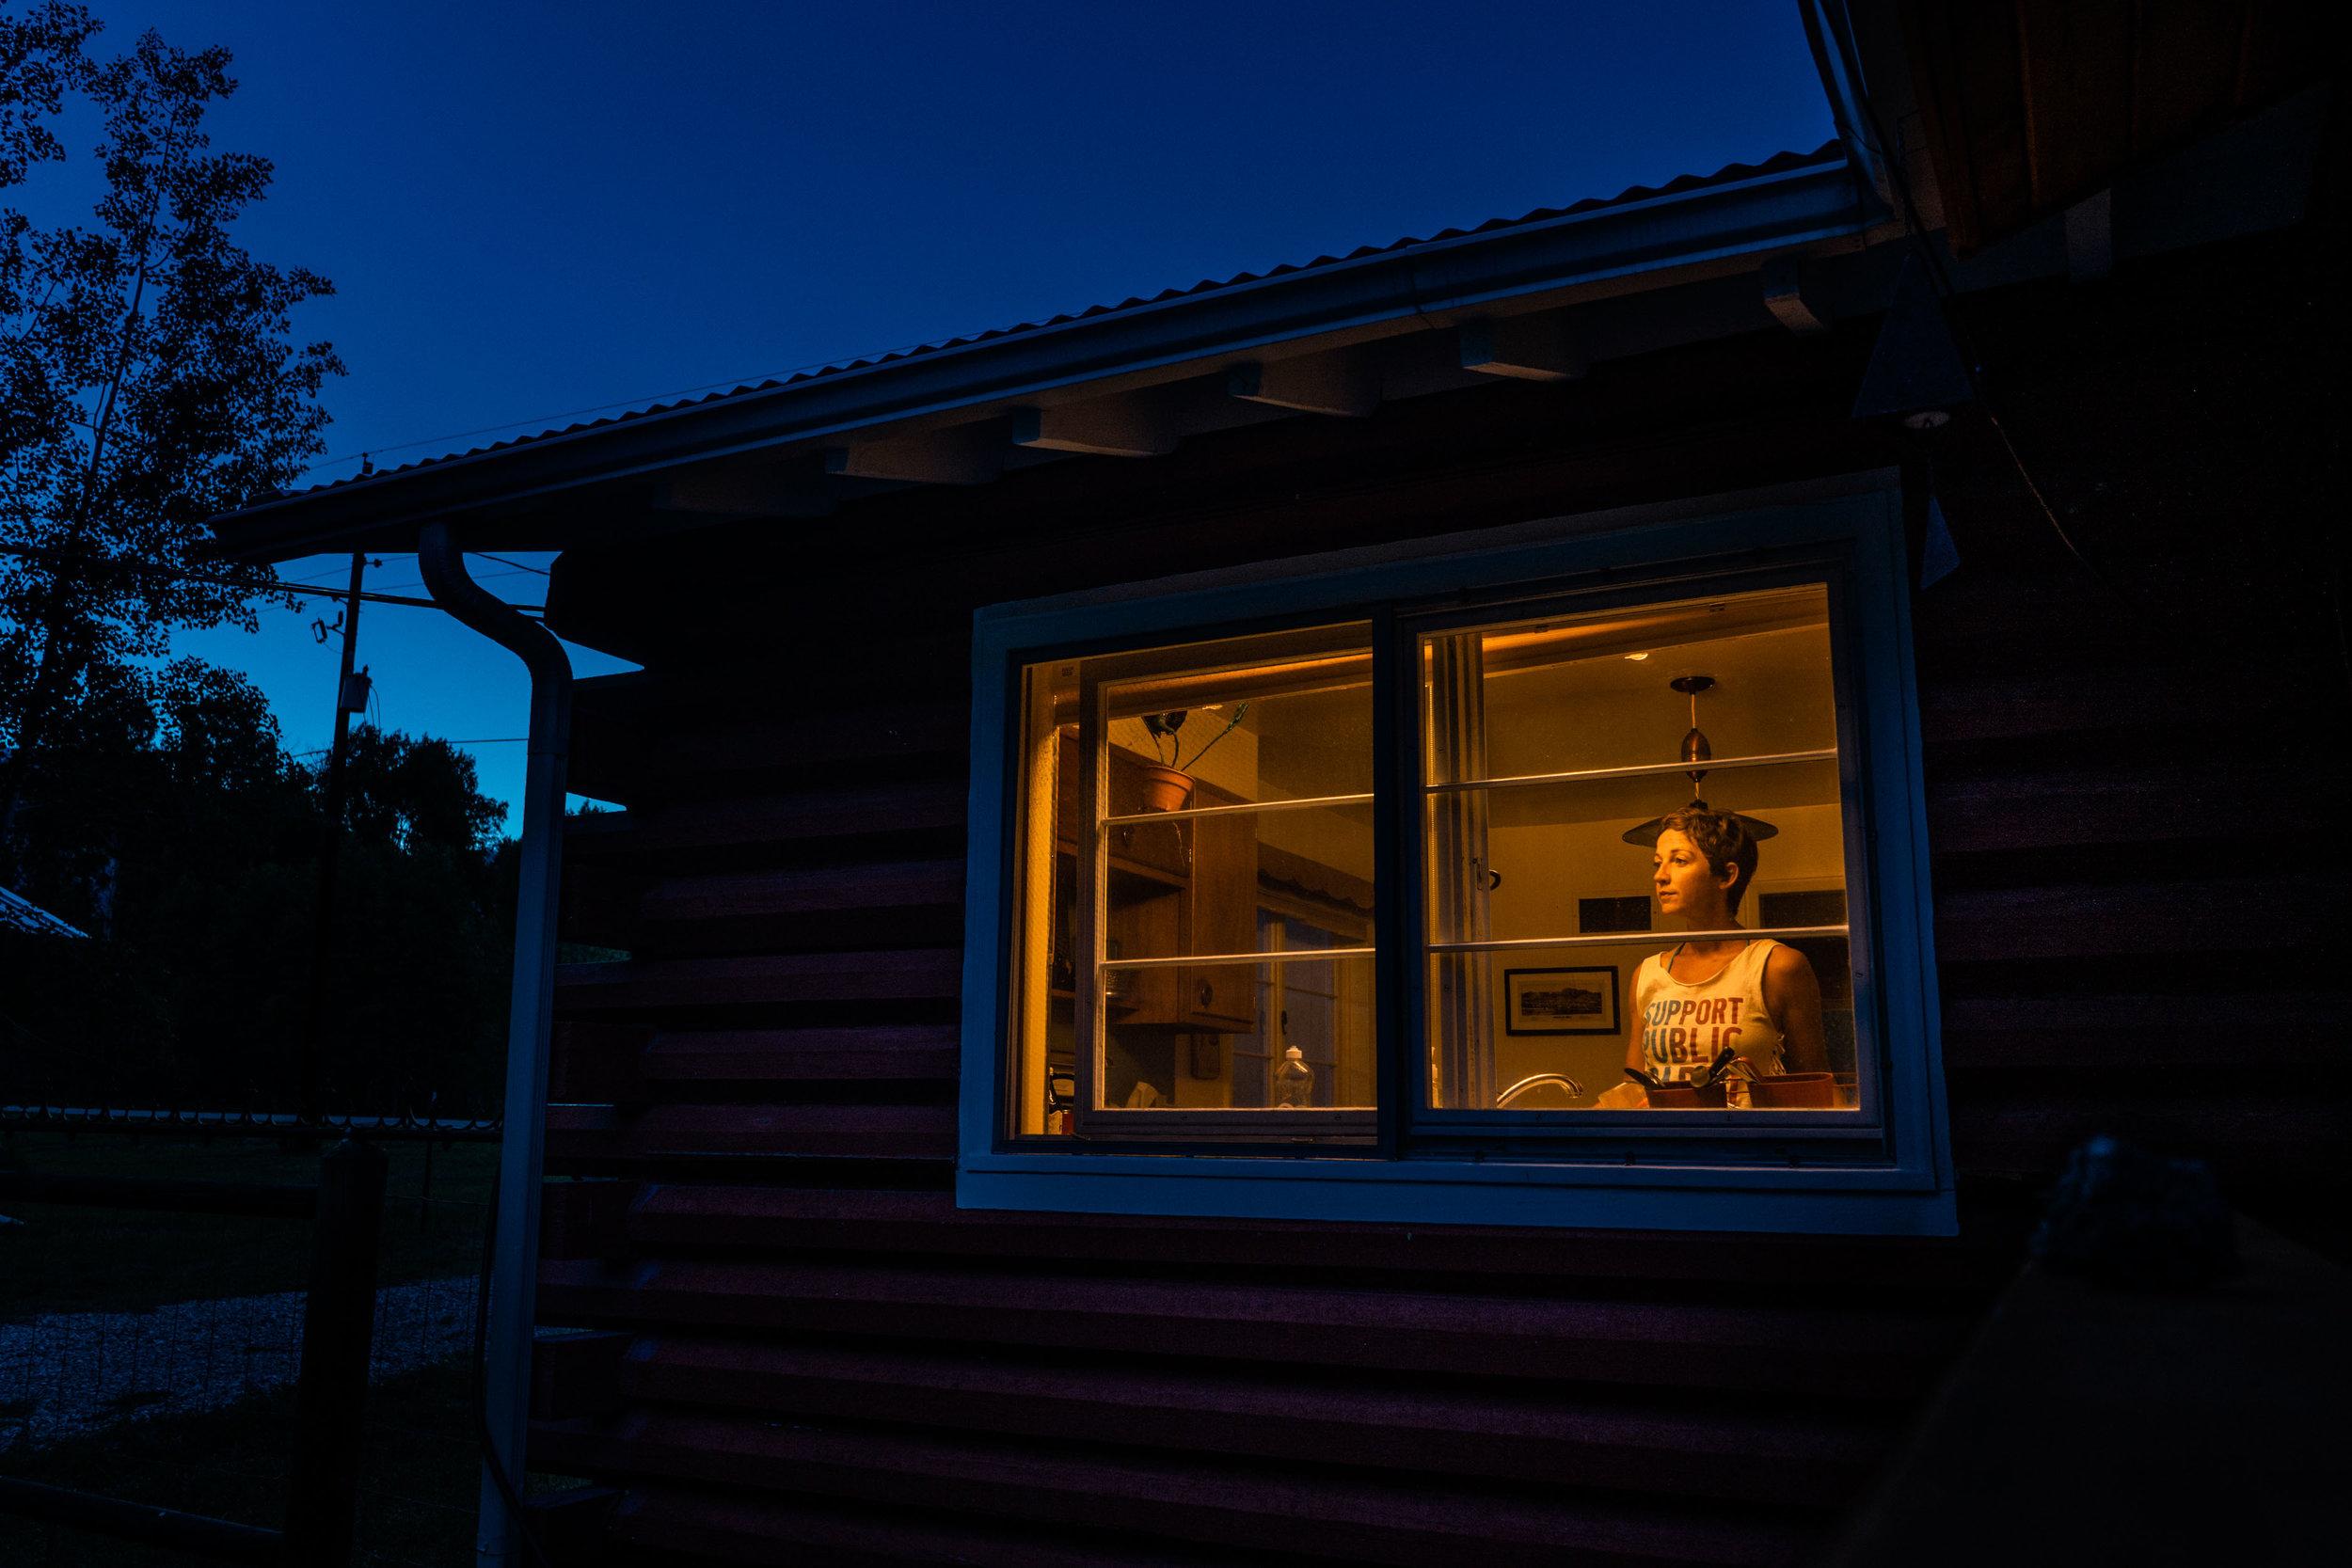 2019-06-14-Salida-summer-0070-Edit.jpg